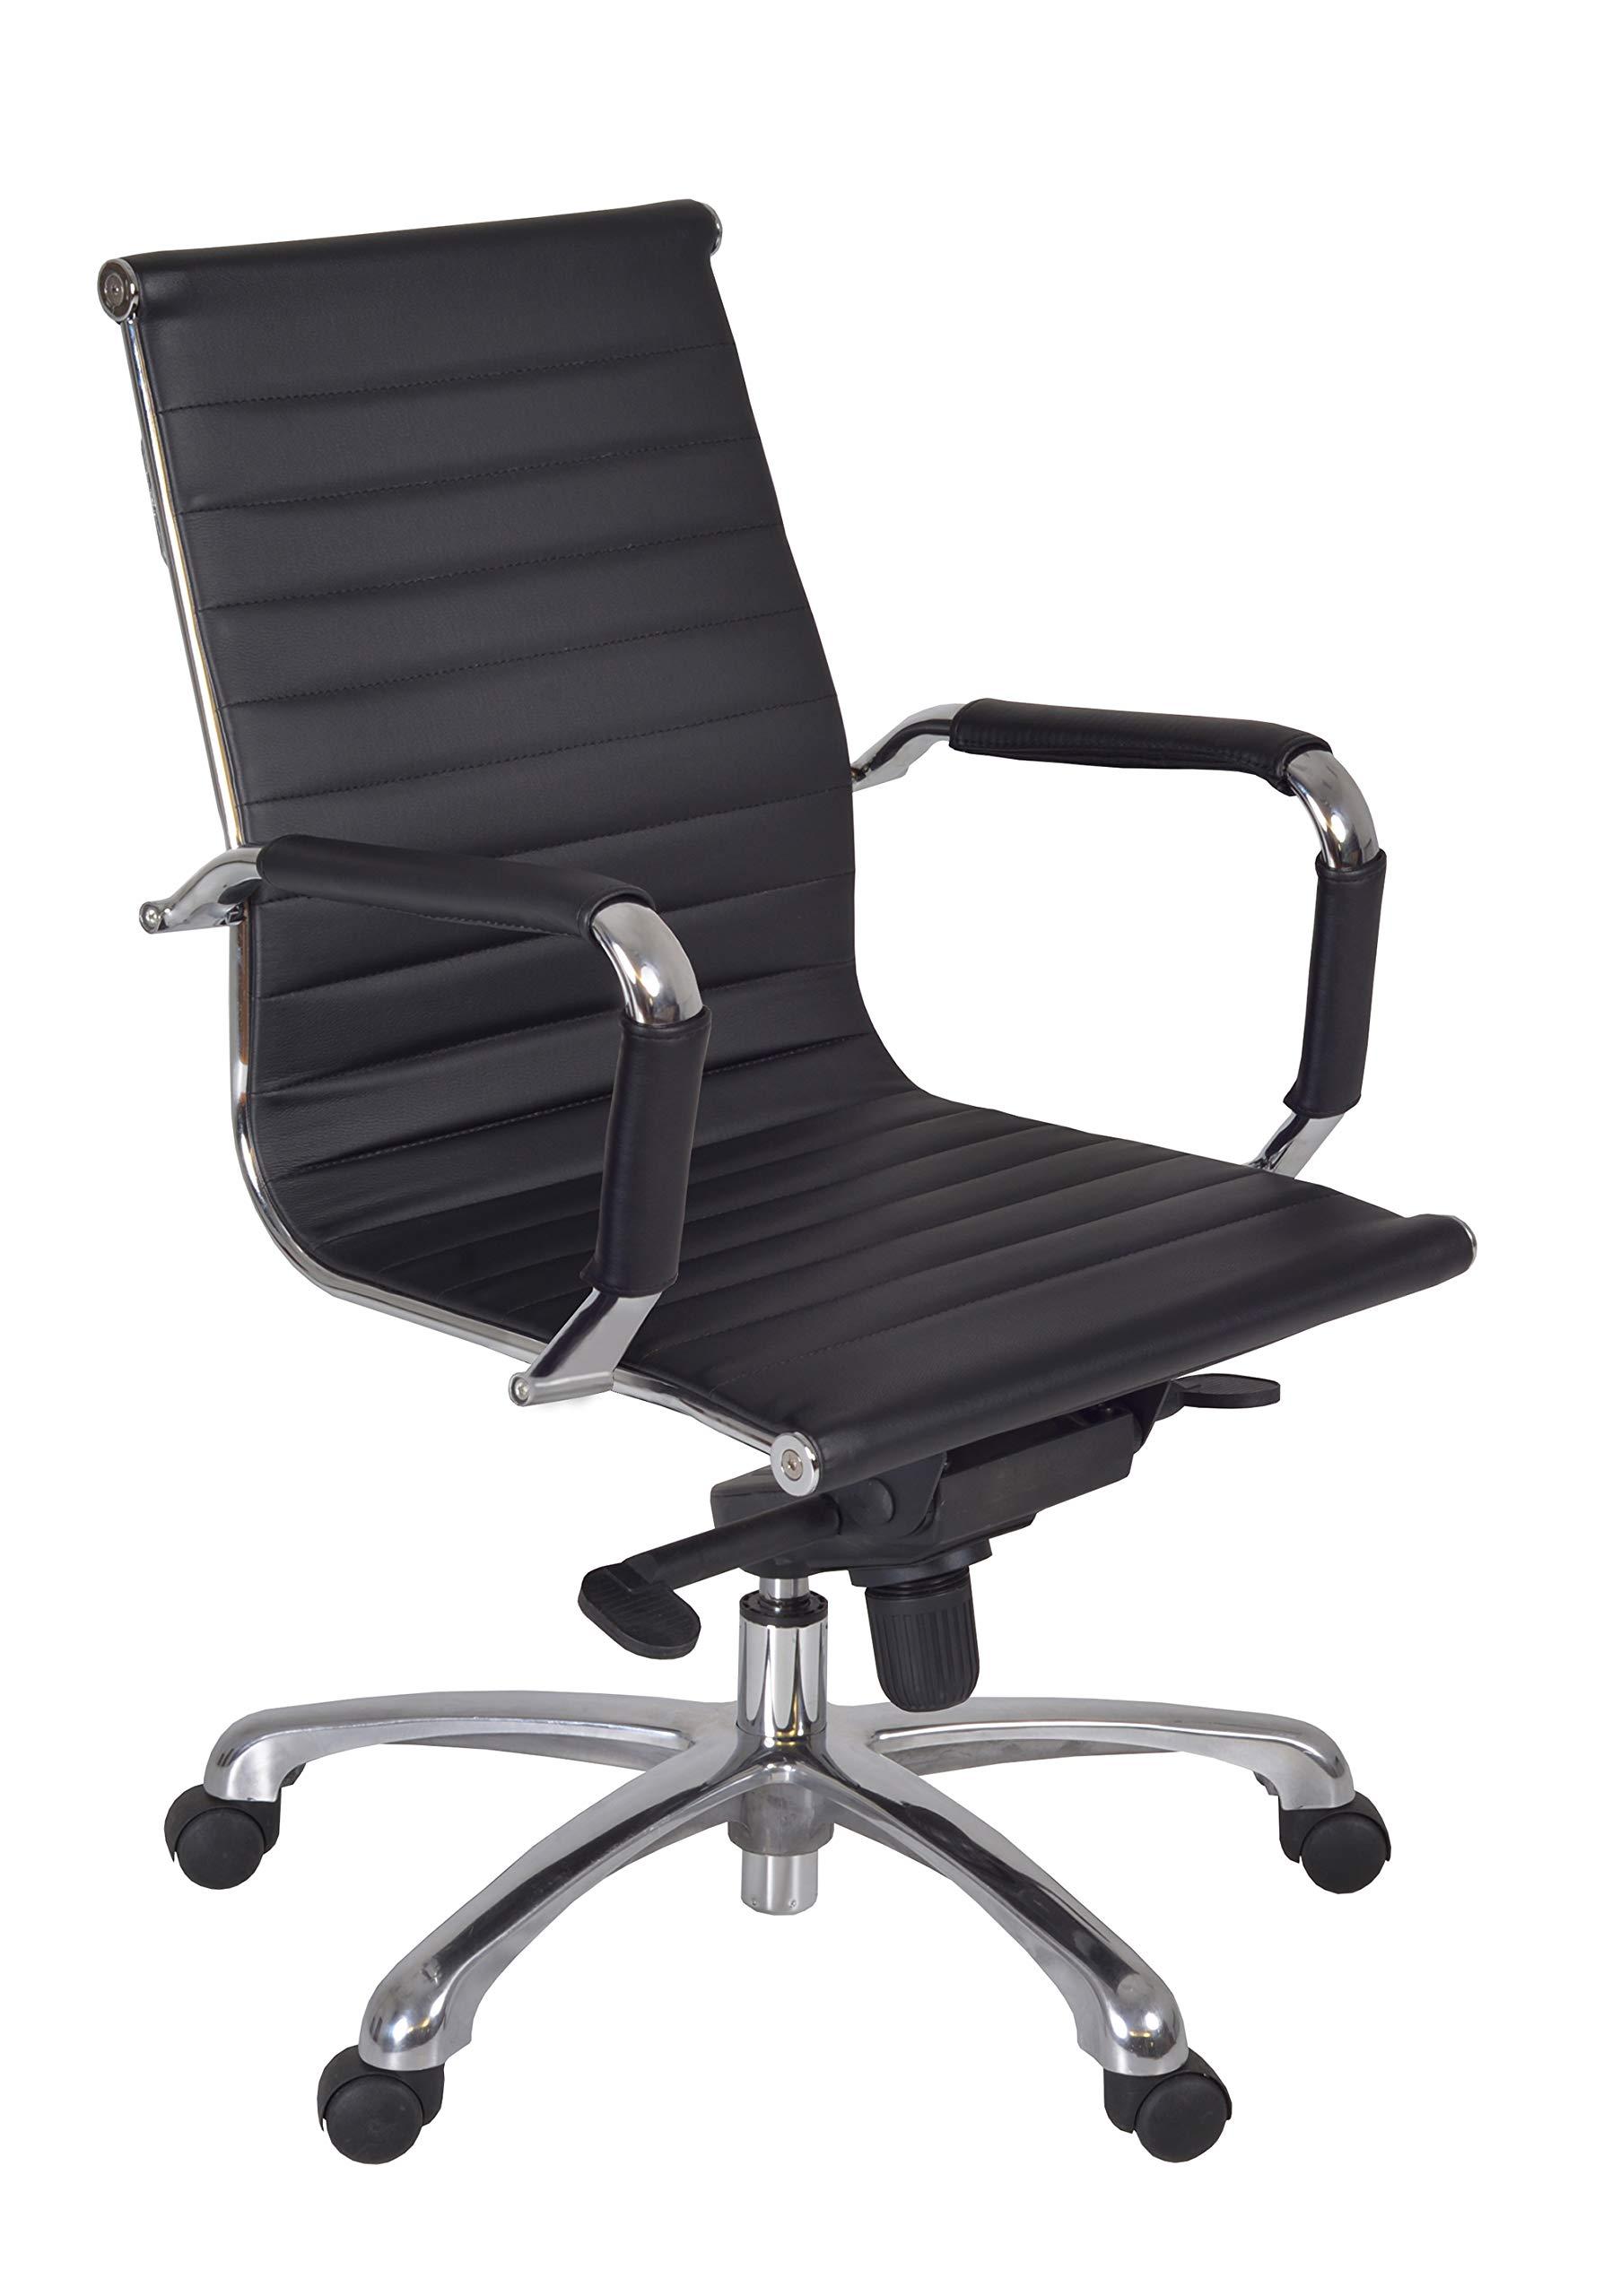 Regency Solace Black Leather/Chrome Swivel Chair